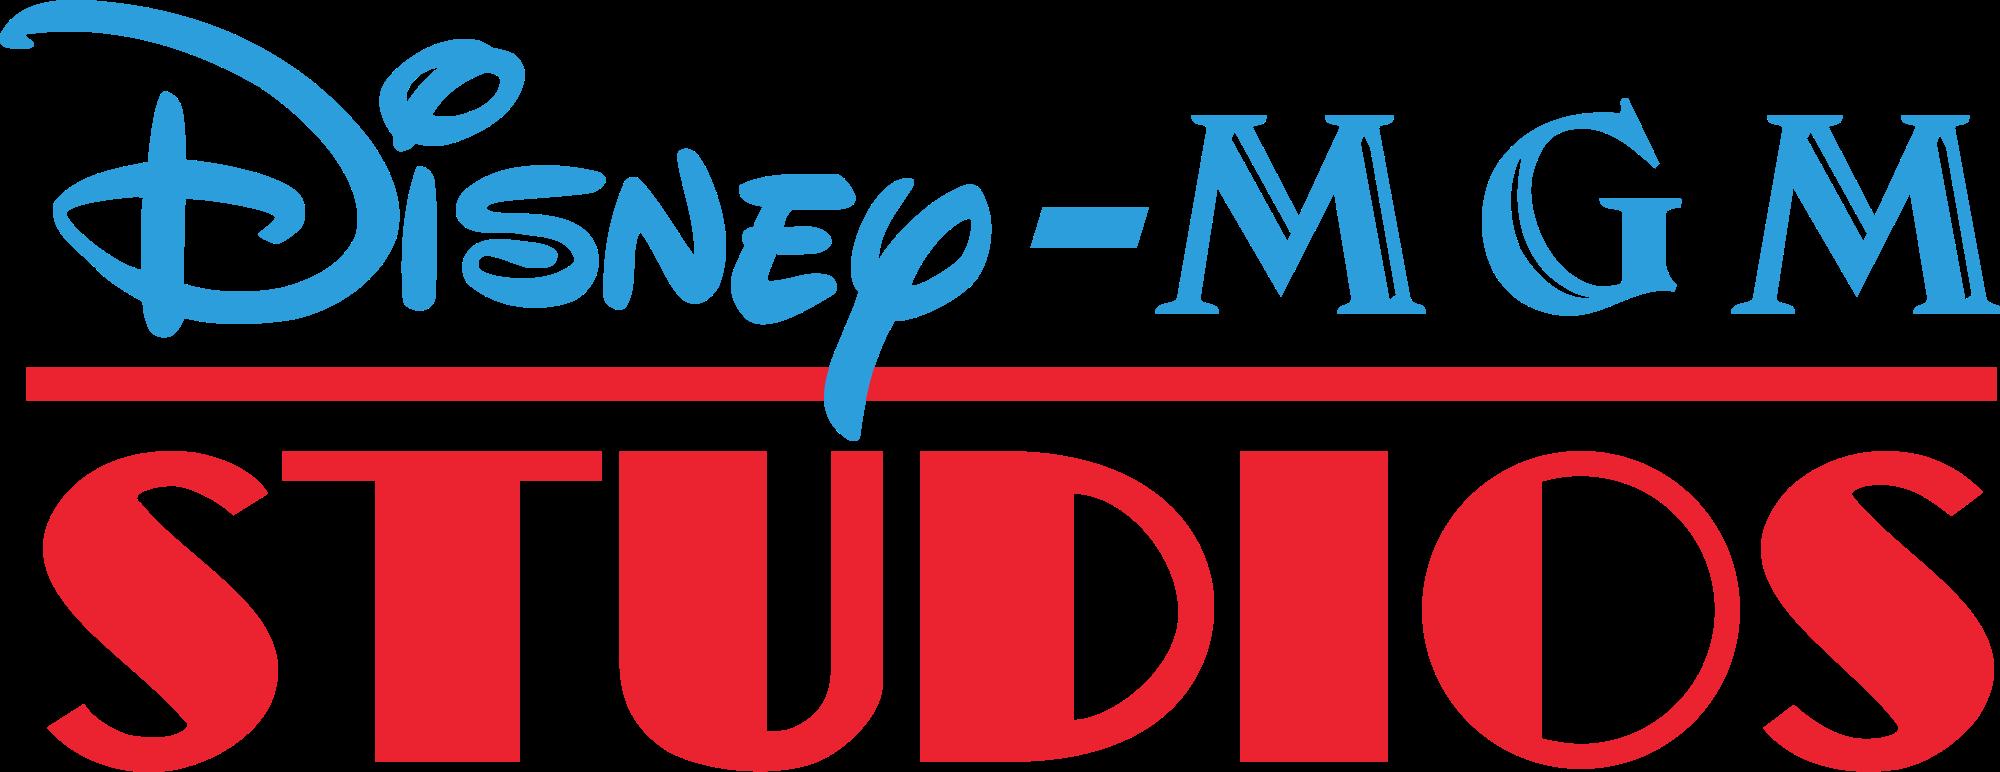 Disneyland Logo Transparent